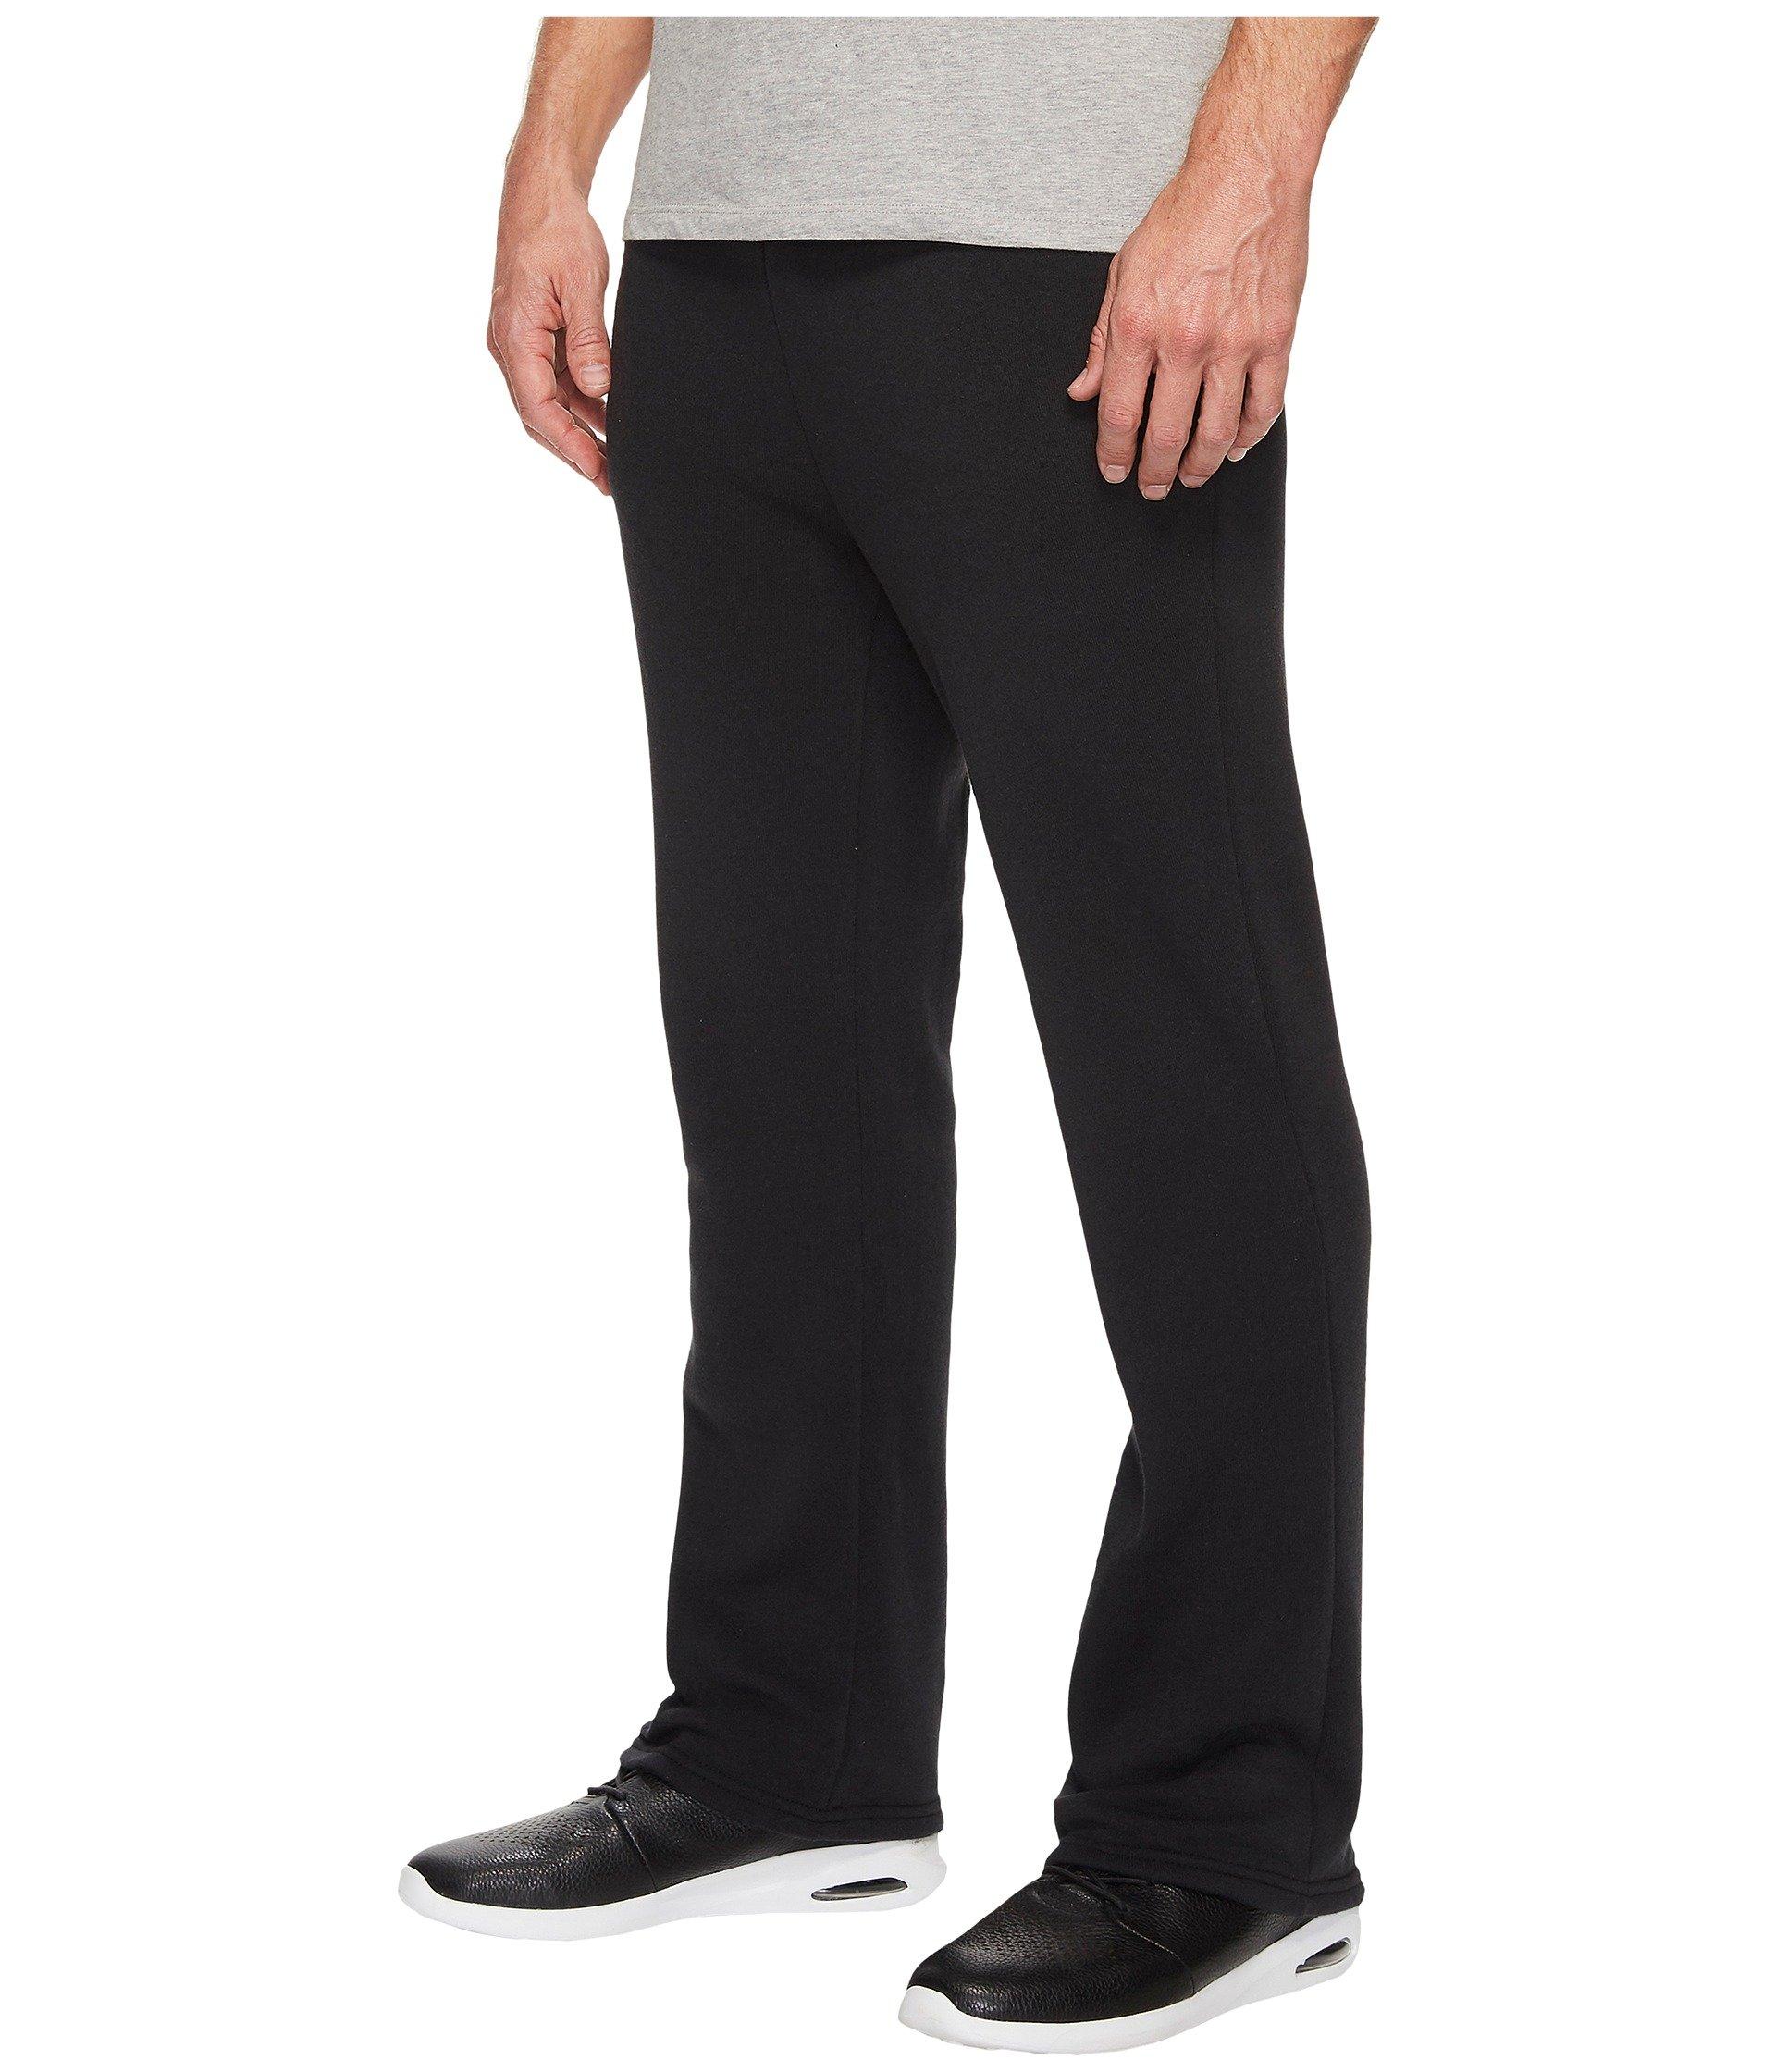 Bottom True Alternative Open Black Fleece Sweatpants Eco Hustle The B6qqXgwSa